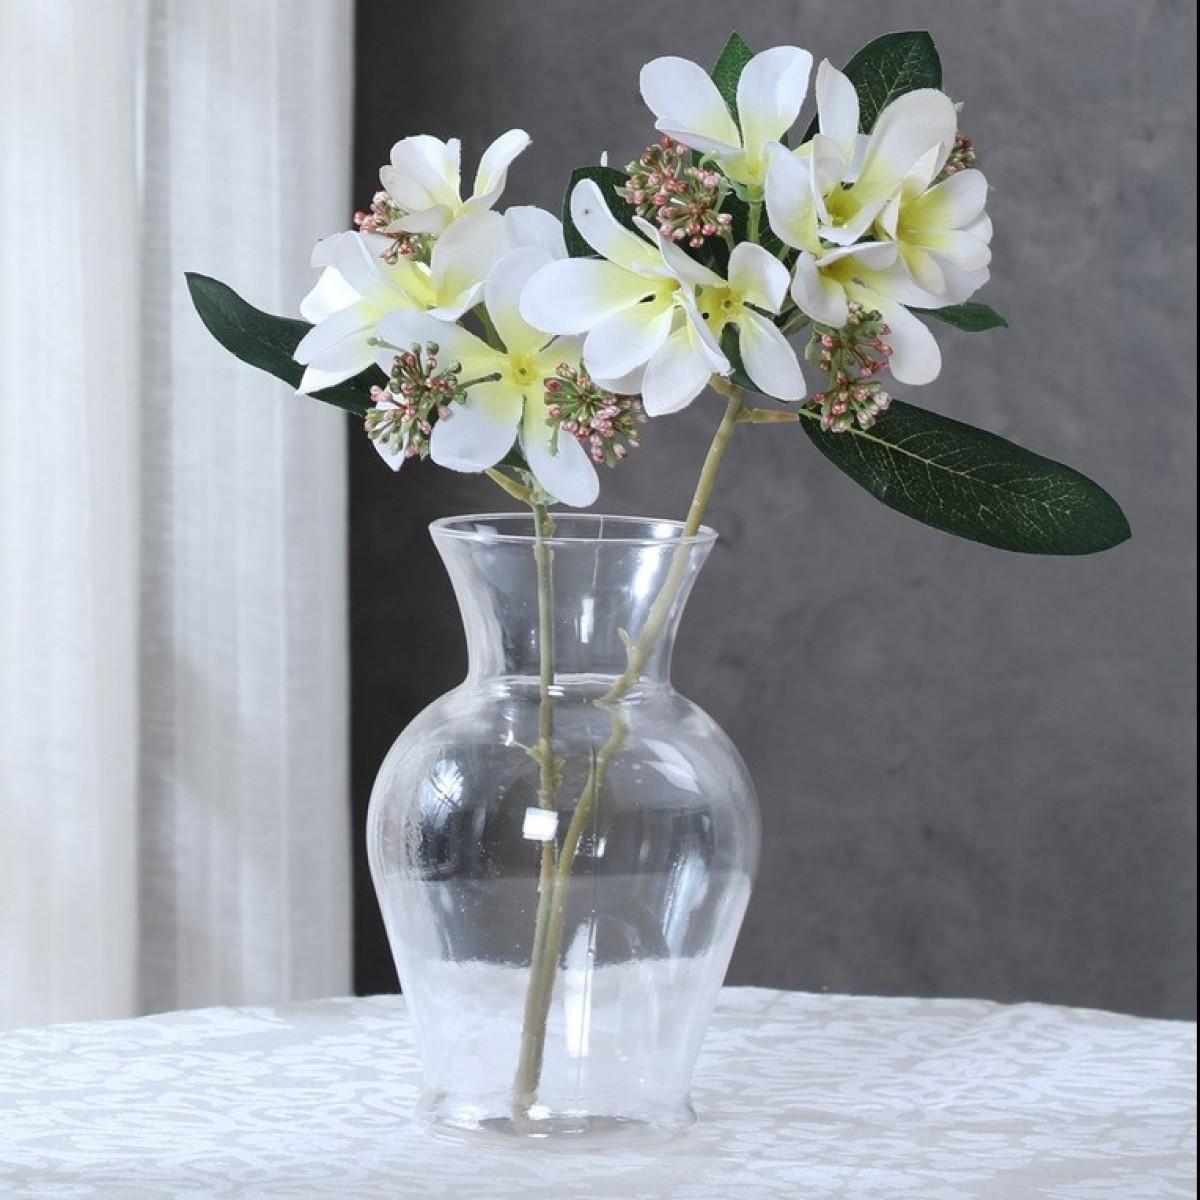 5106 Classic Urn Clear 8.5x18cm Acrylic Vase - 1 No